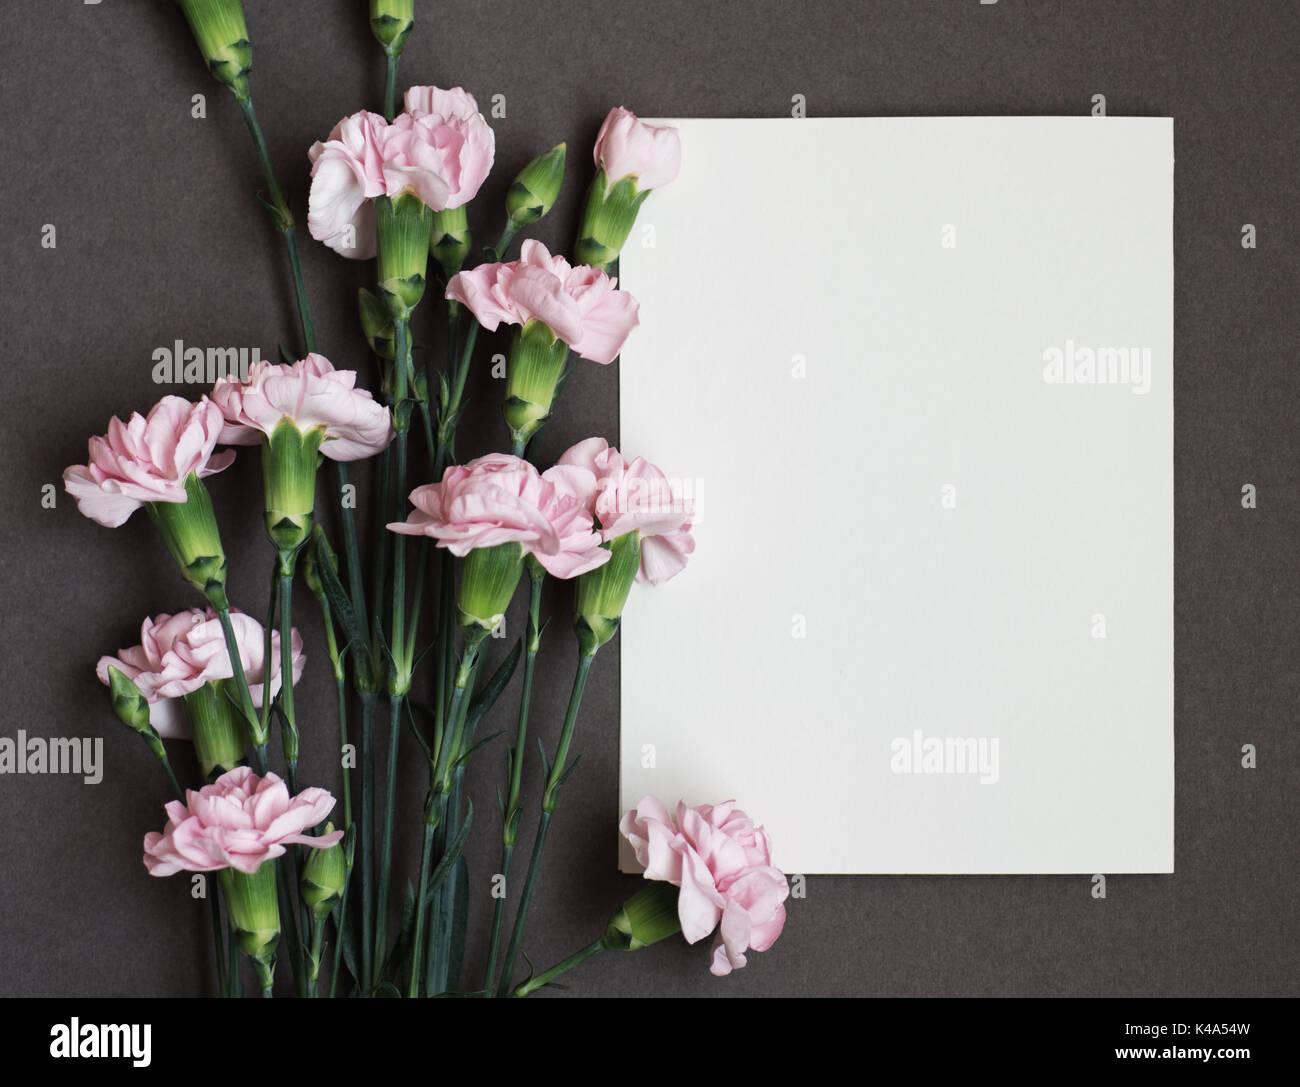 Wedding Greetings Card Stockfotos & Wedding Greetings Card Bilder ...